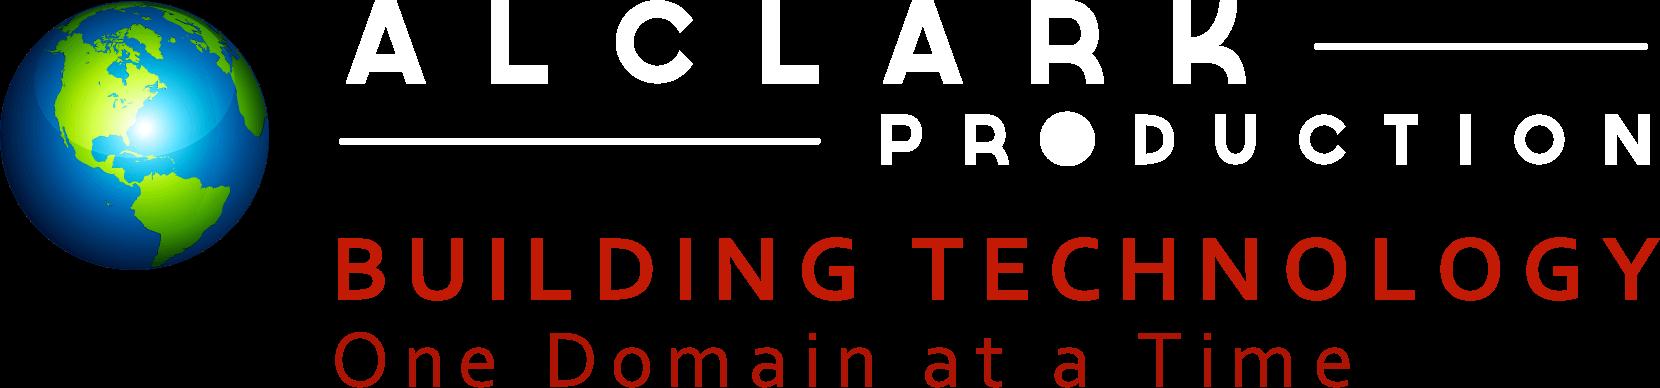 Alclark Production